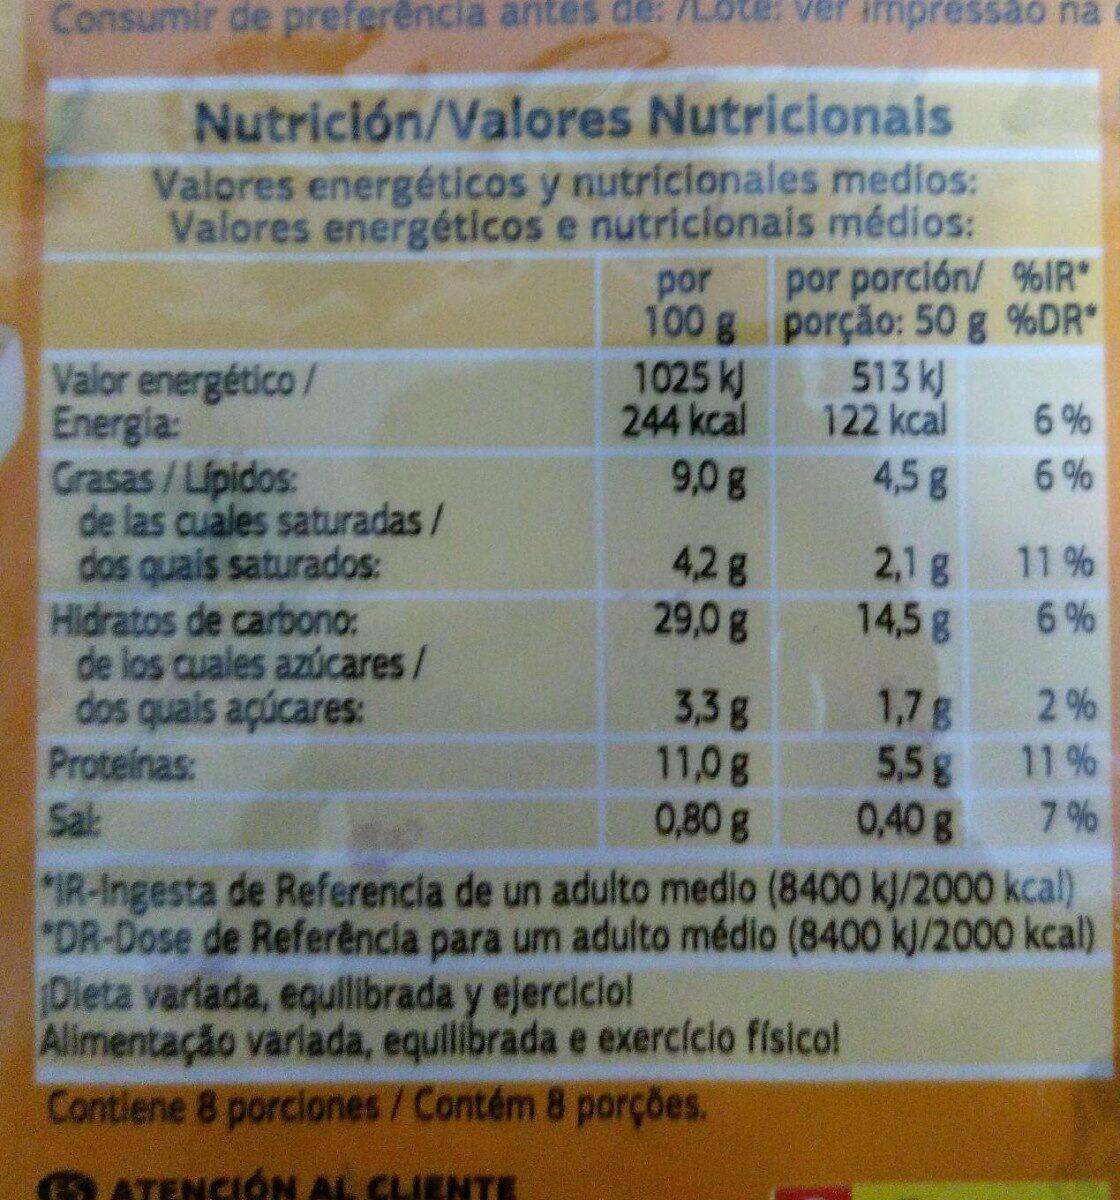 Pizza carbonara dia - Nutrition facts - pt